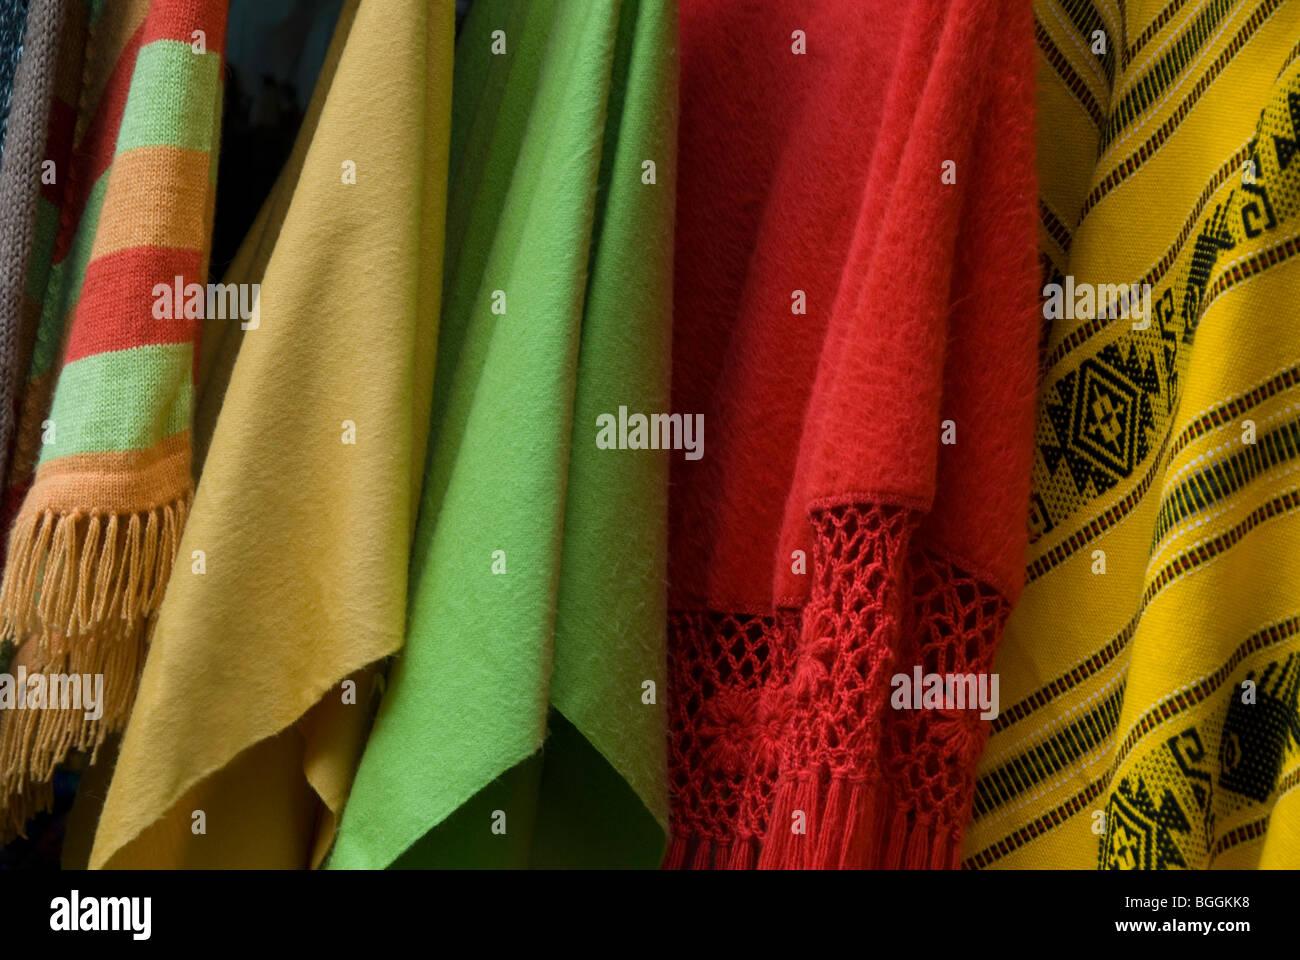 Woolen ponchos in market in Puerto Varas, Los Lagos Region (Lake District) of Chile - Stock Image